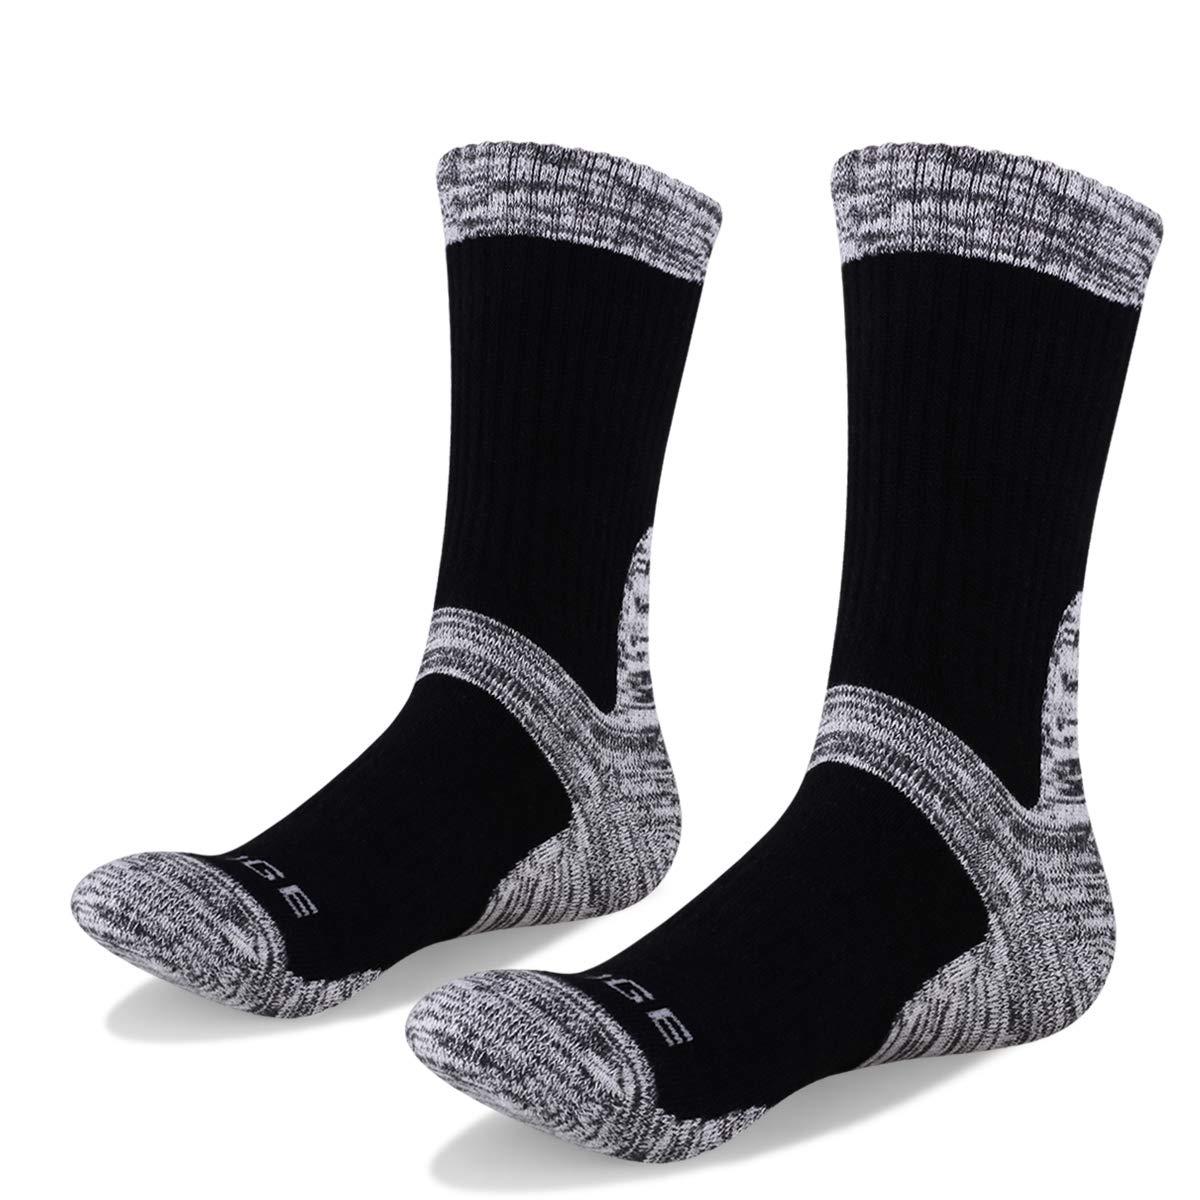 Mens Running Socks Mountaineering Trekking Hiking Outdoor Sport Athletic Crew socks 3 Pairs 9 US size